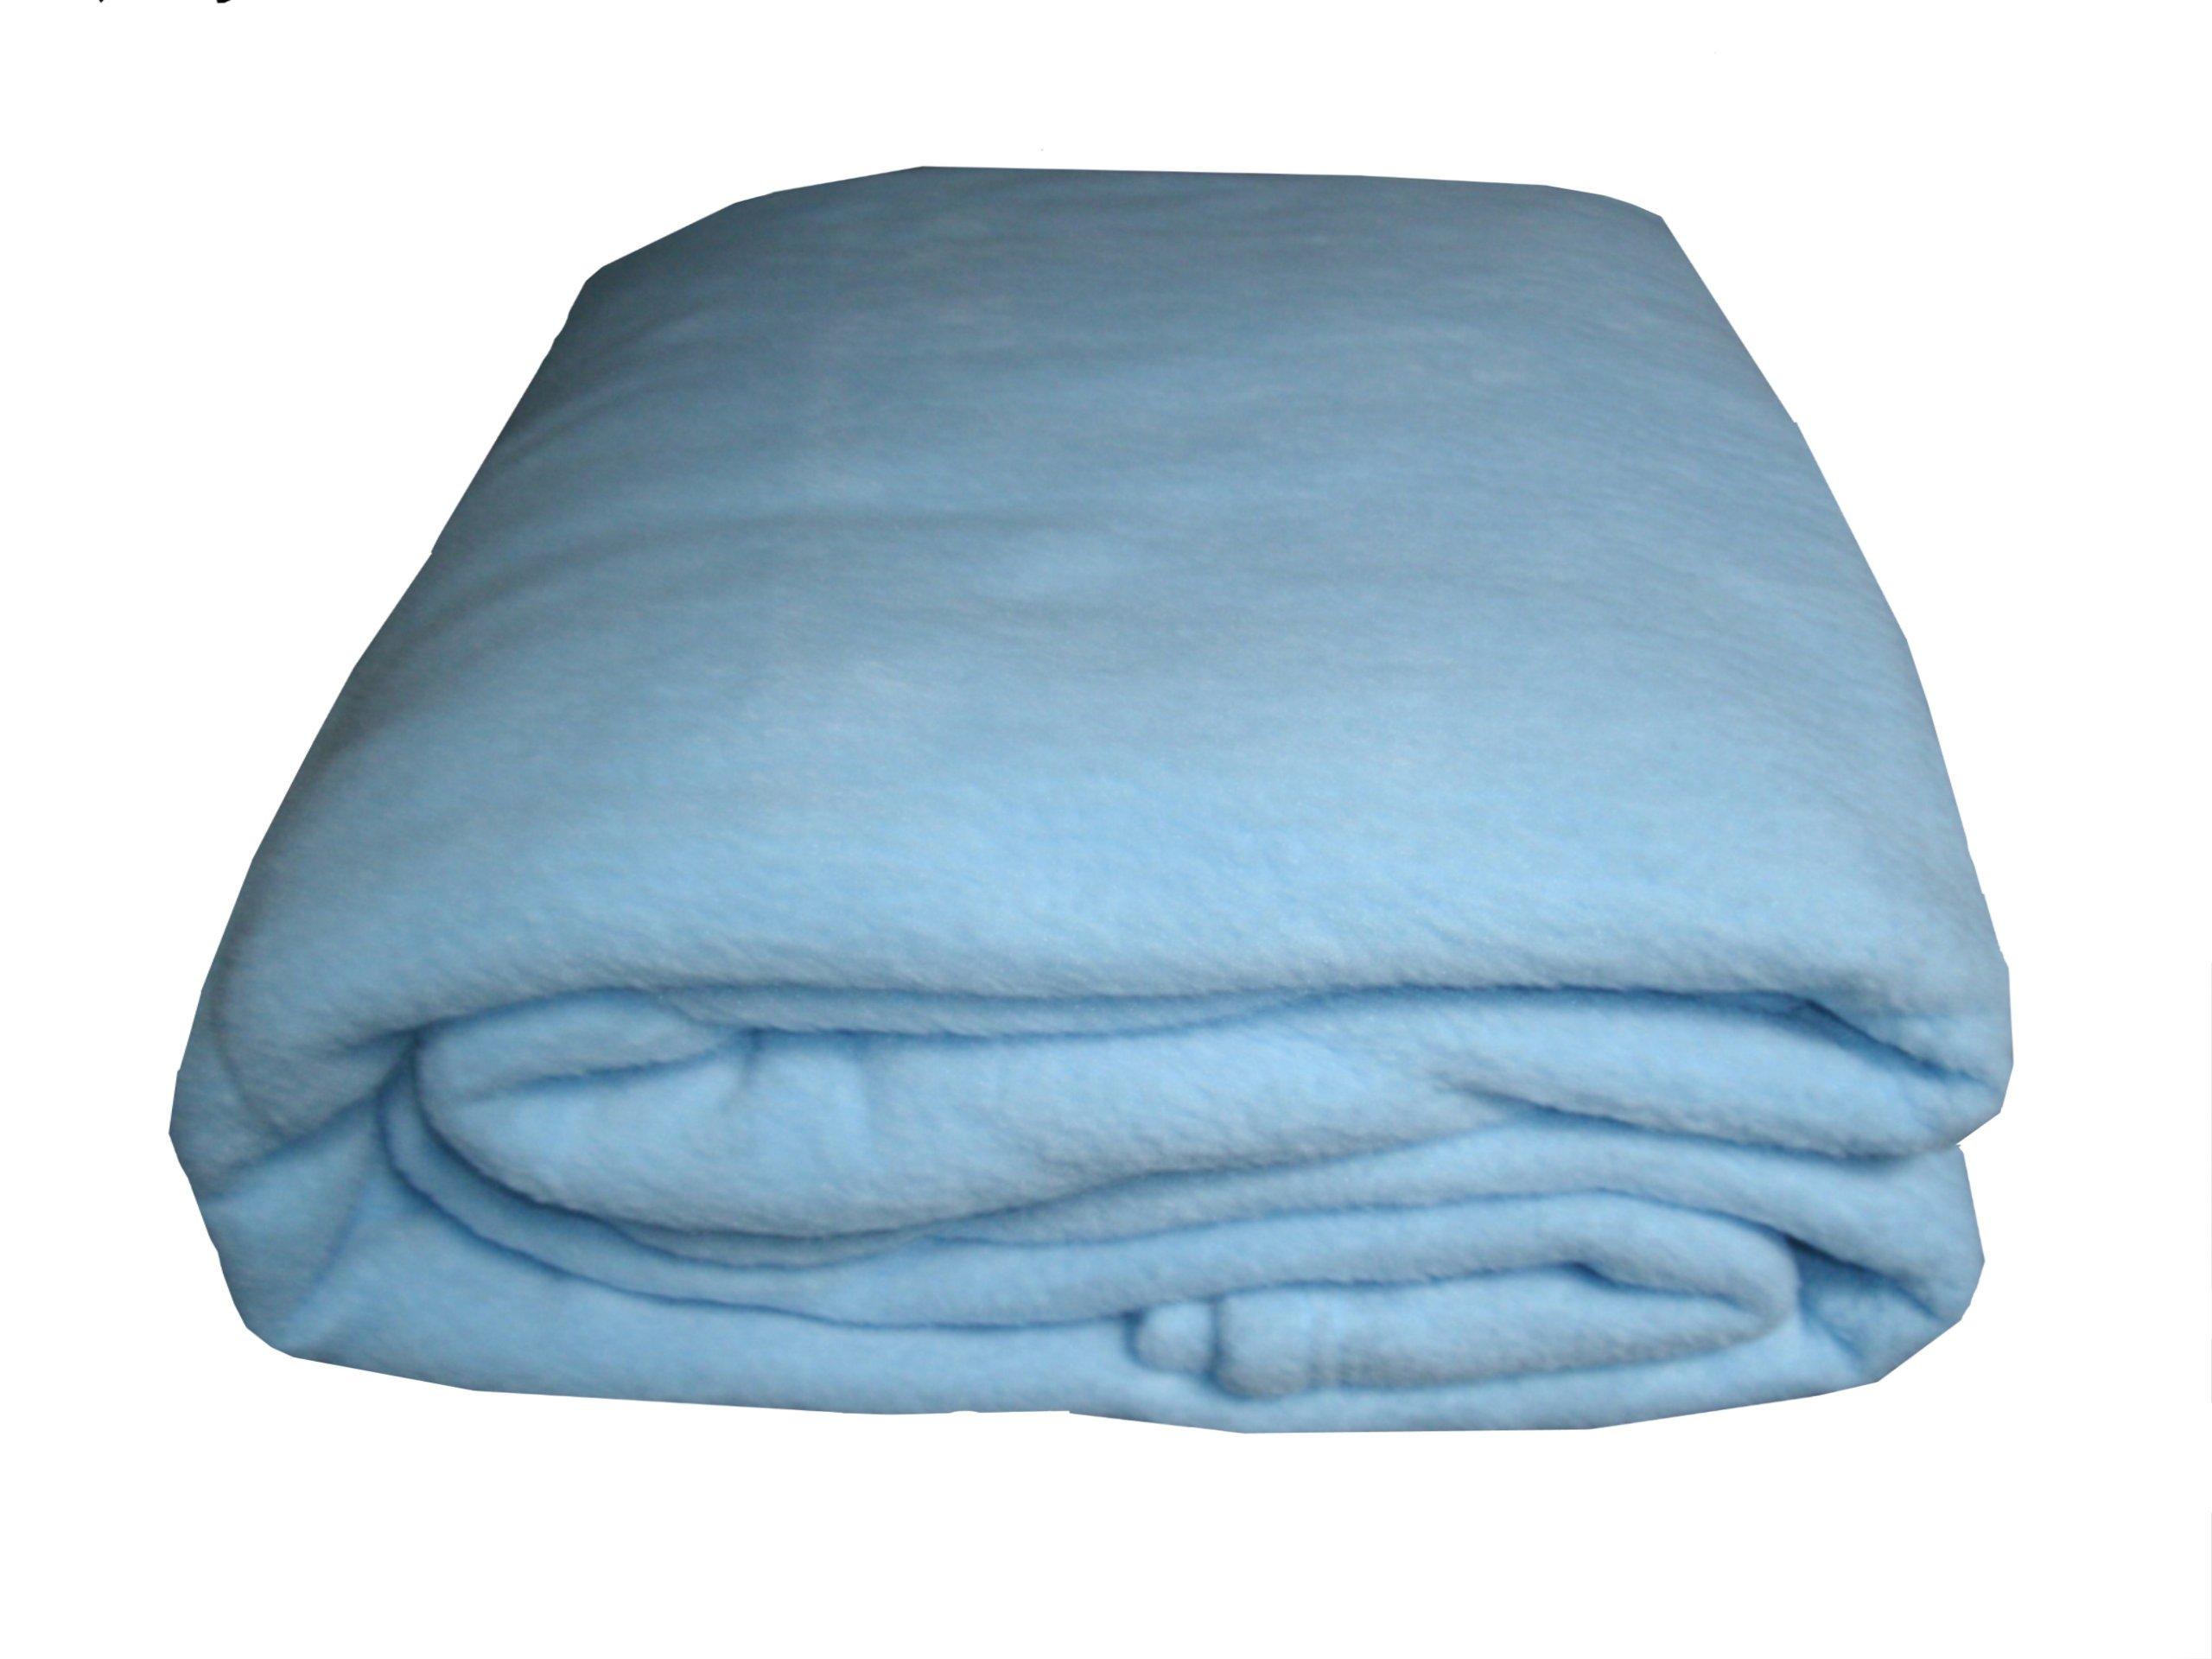 ALTA-Citi Comfort (ALTDJ) Luxury Hotel Fleece Blanket, King, Blue